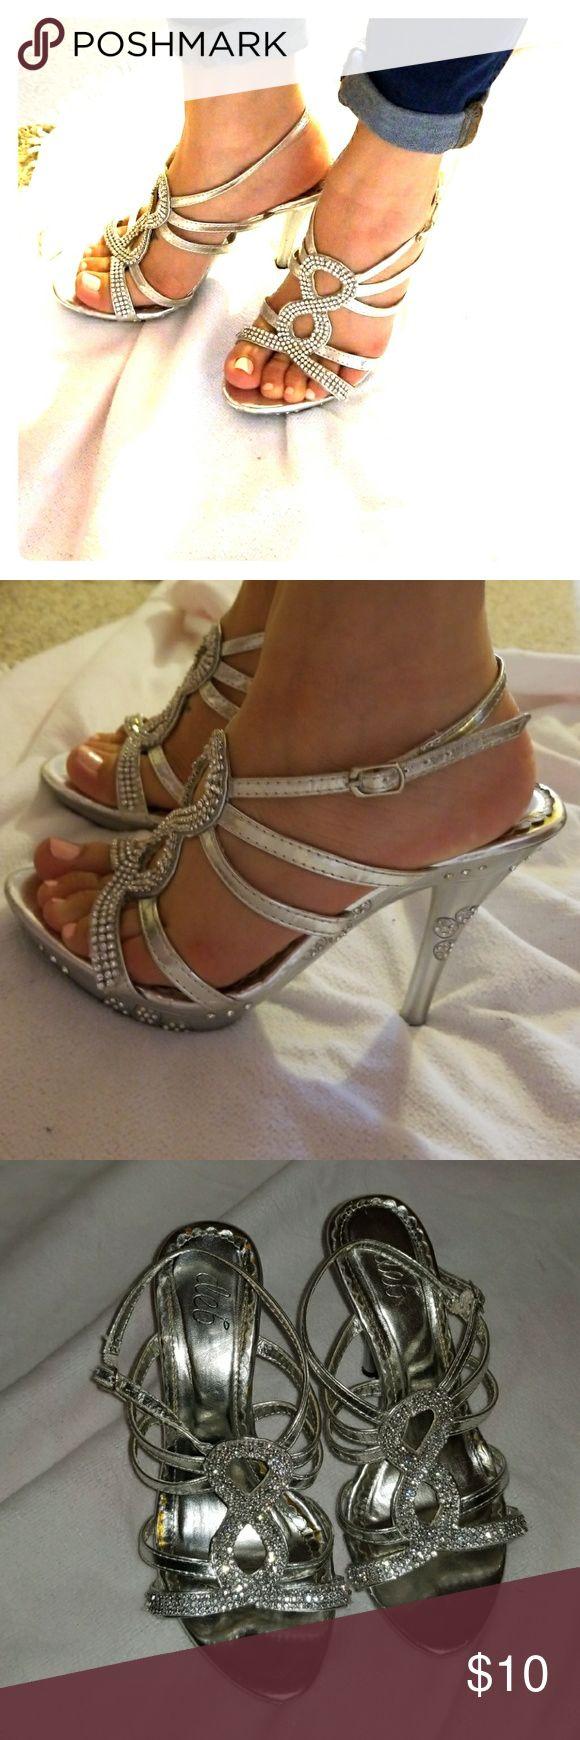 Silver sparkly heels Glitter heels Deb Shoes Heels